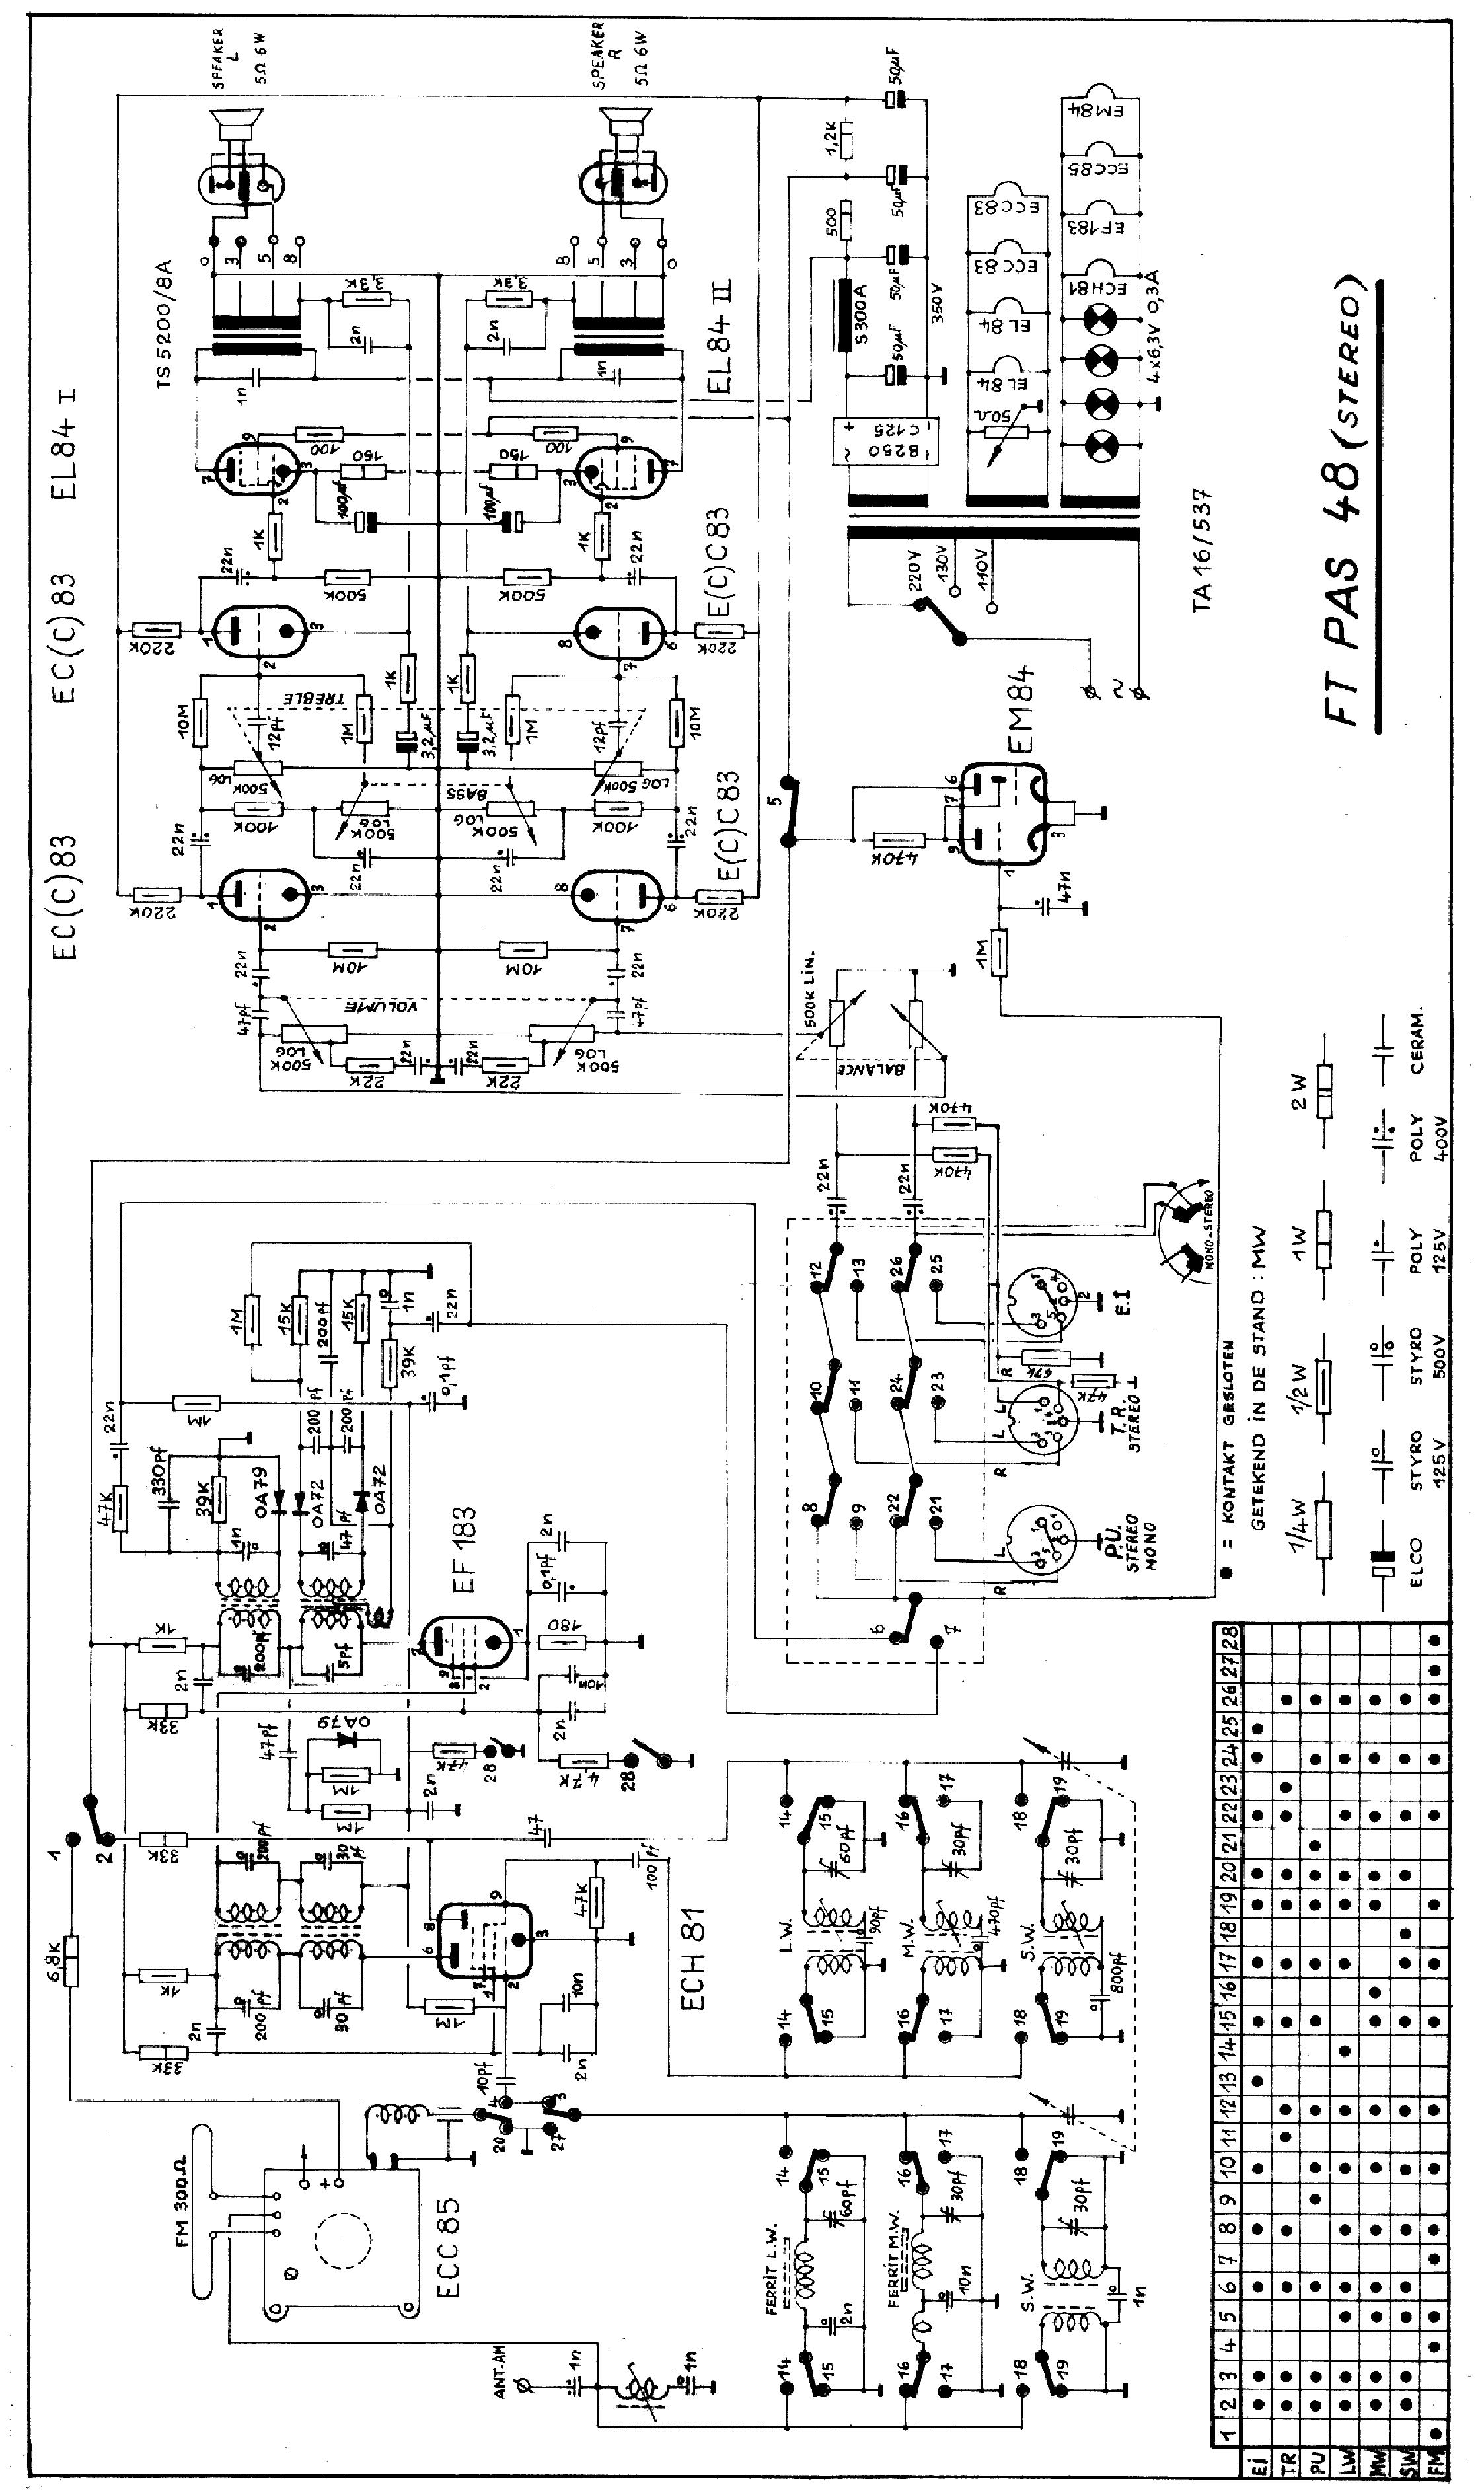 carad epas63 2x10w stereo transistor amplifier sch service